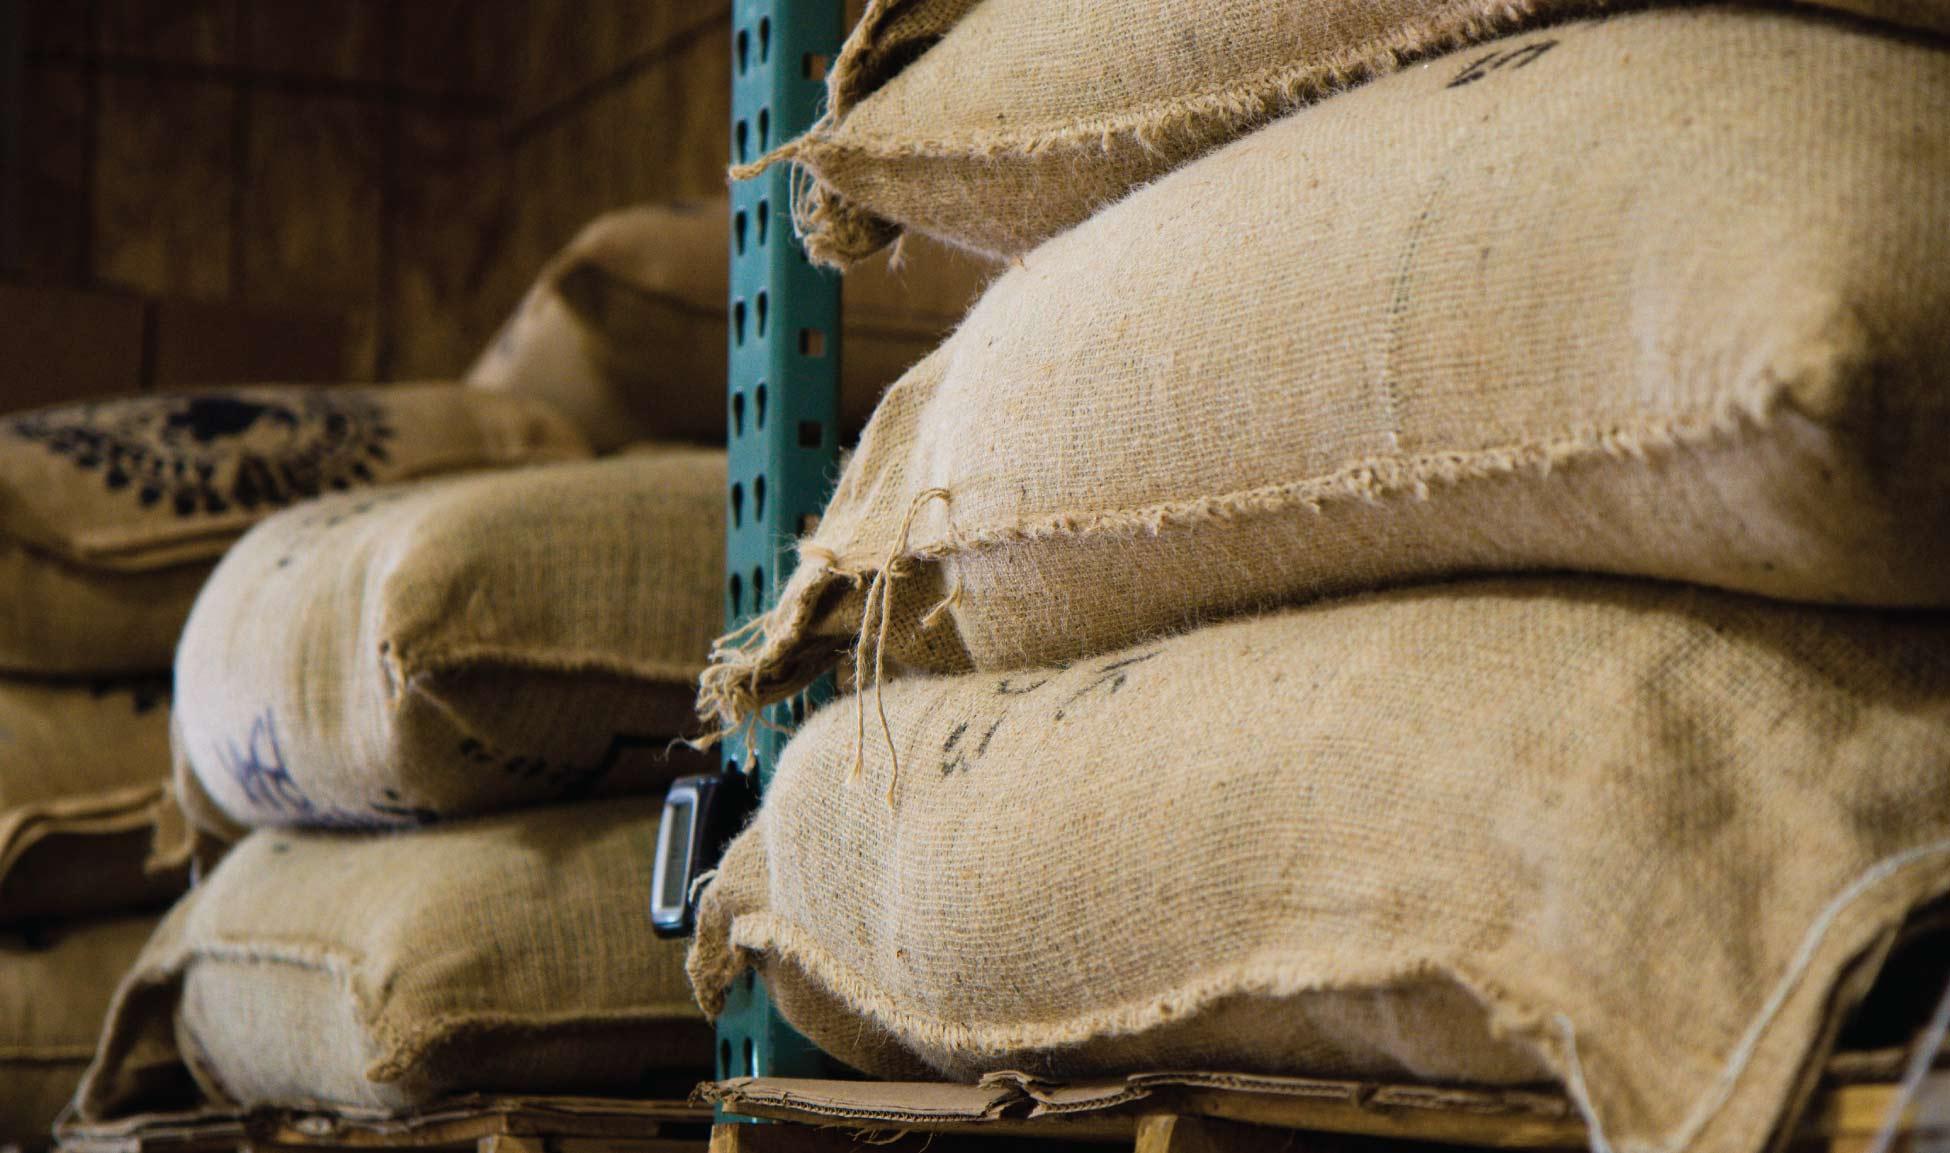 Kaffee Großhandel Guide (B2B) für Abnehmer